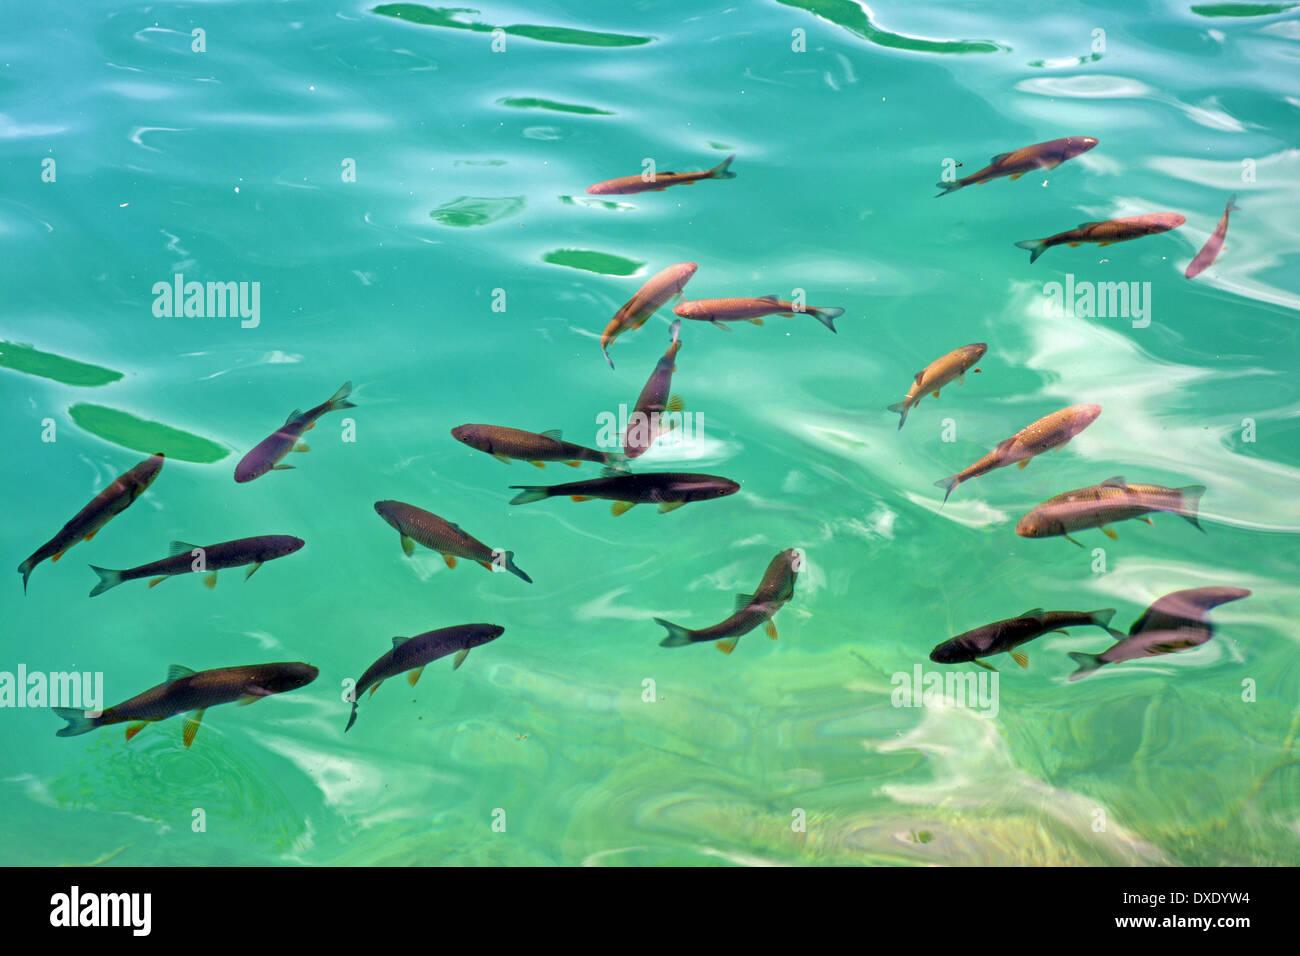 Fish in Plitvice lakes, Croatia - Stock Image